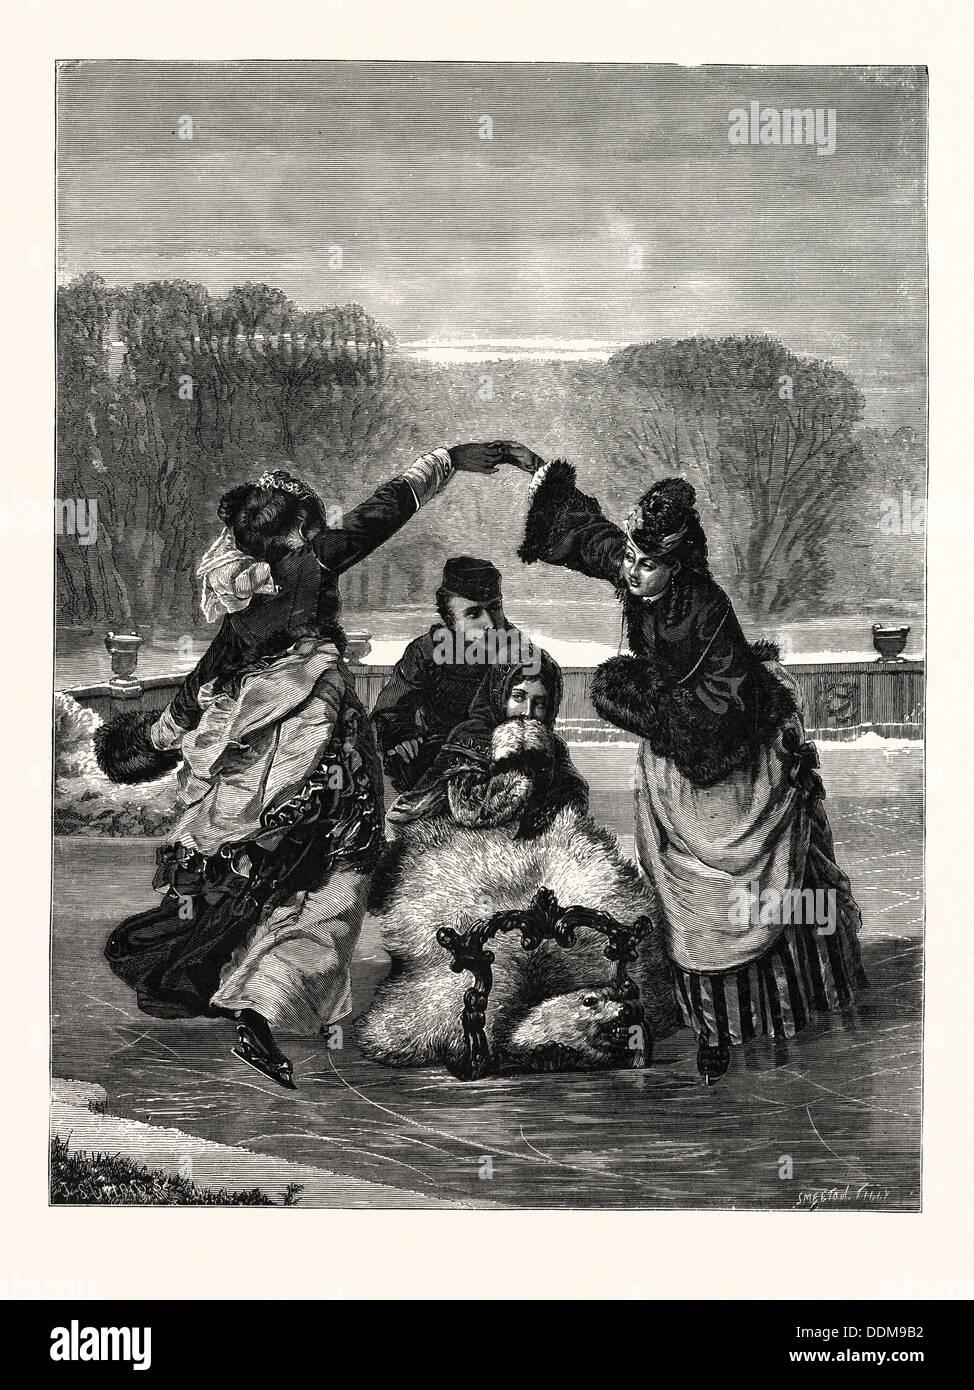 WINTER PASTIMES, Skating. - Stock Image